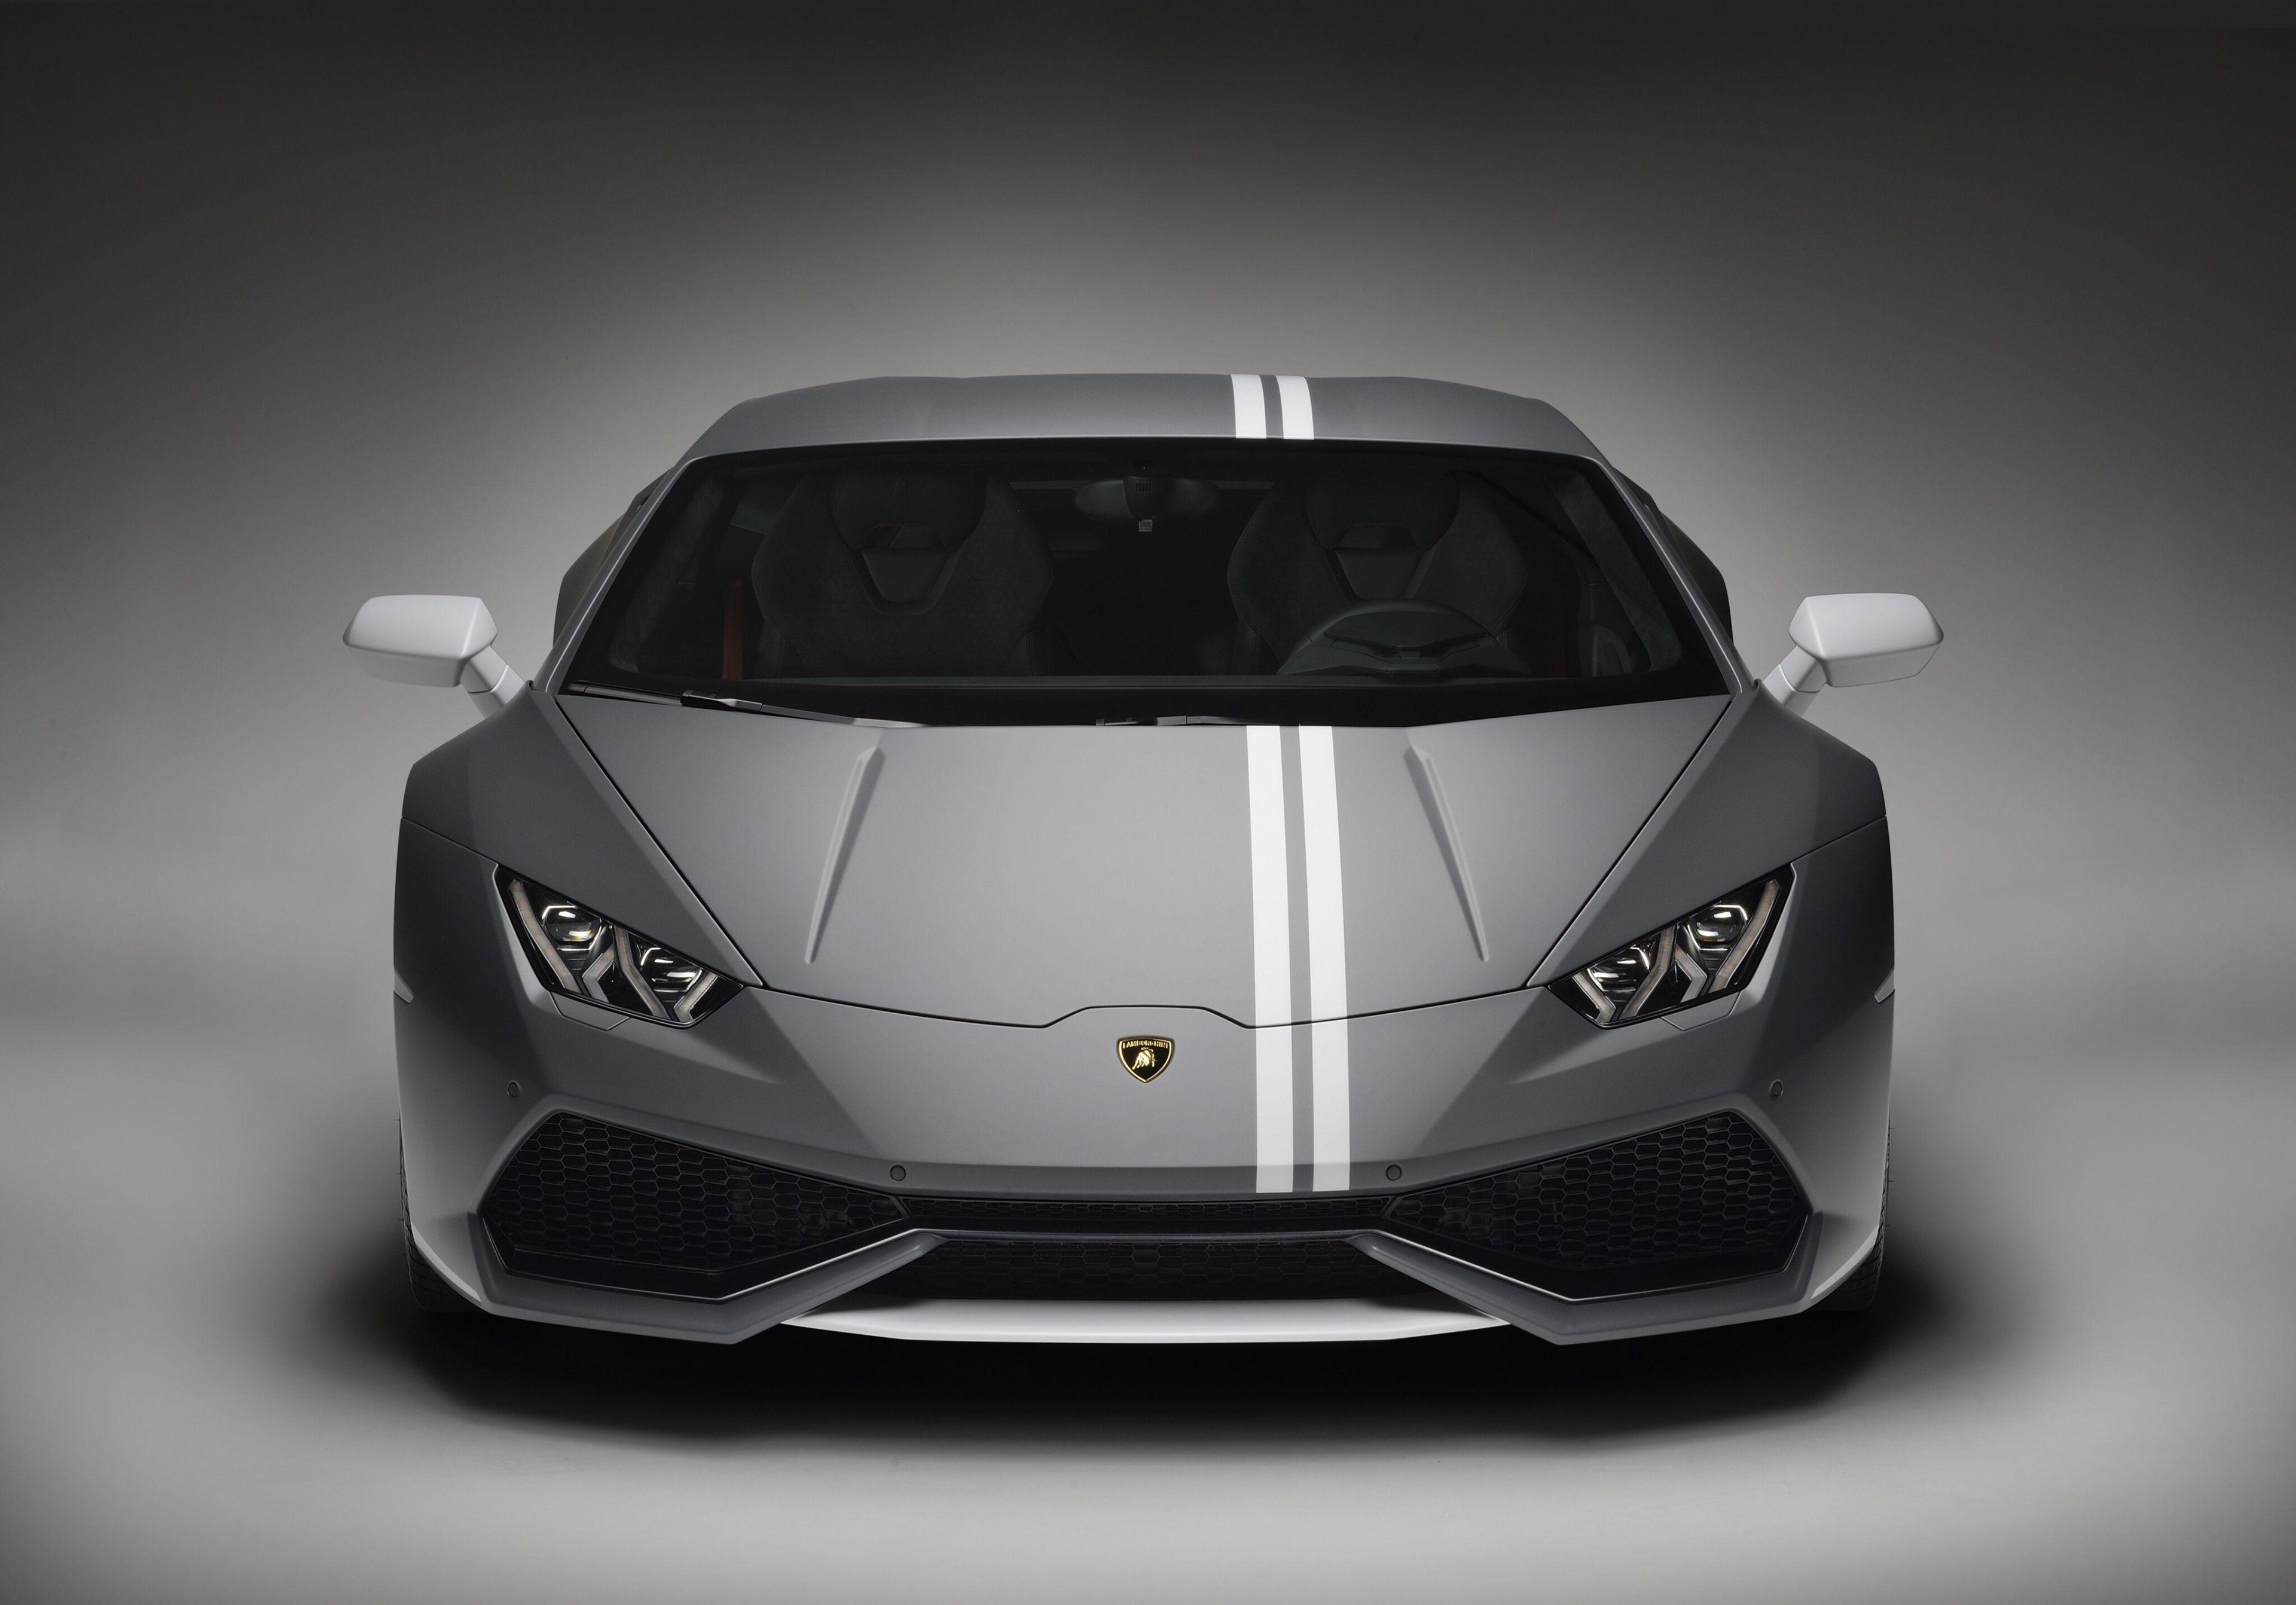 3840x2685 Lamborghini Huracn Lp 610 4 Avio 4k Wallpaper Pc